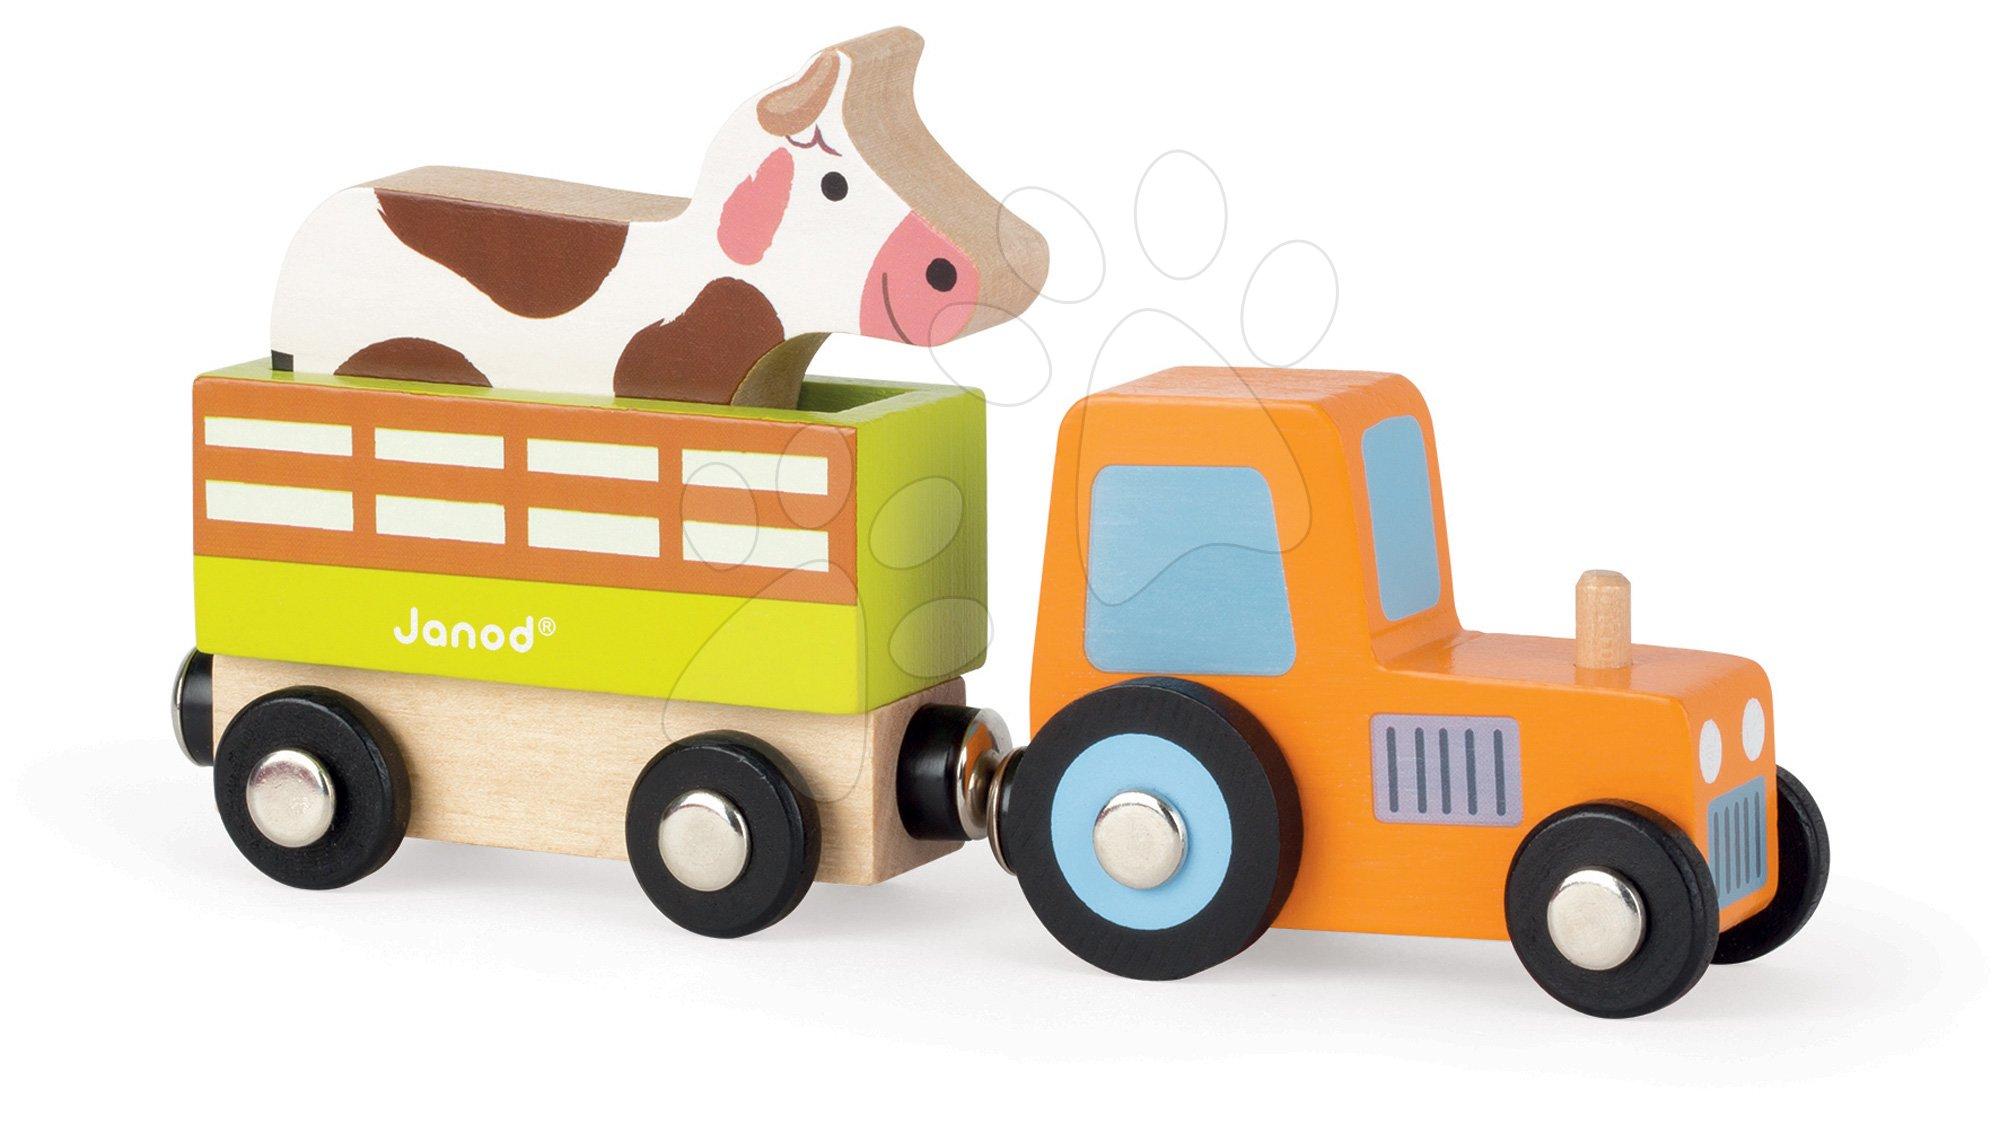 Poľnohospodárske stroje - Drevený magnetický traktor Story Set Janod s kravičkou 3 diely